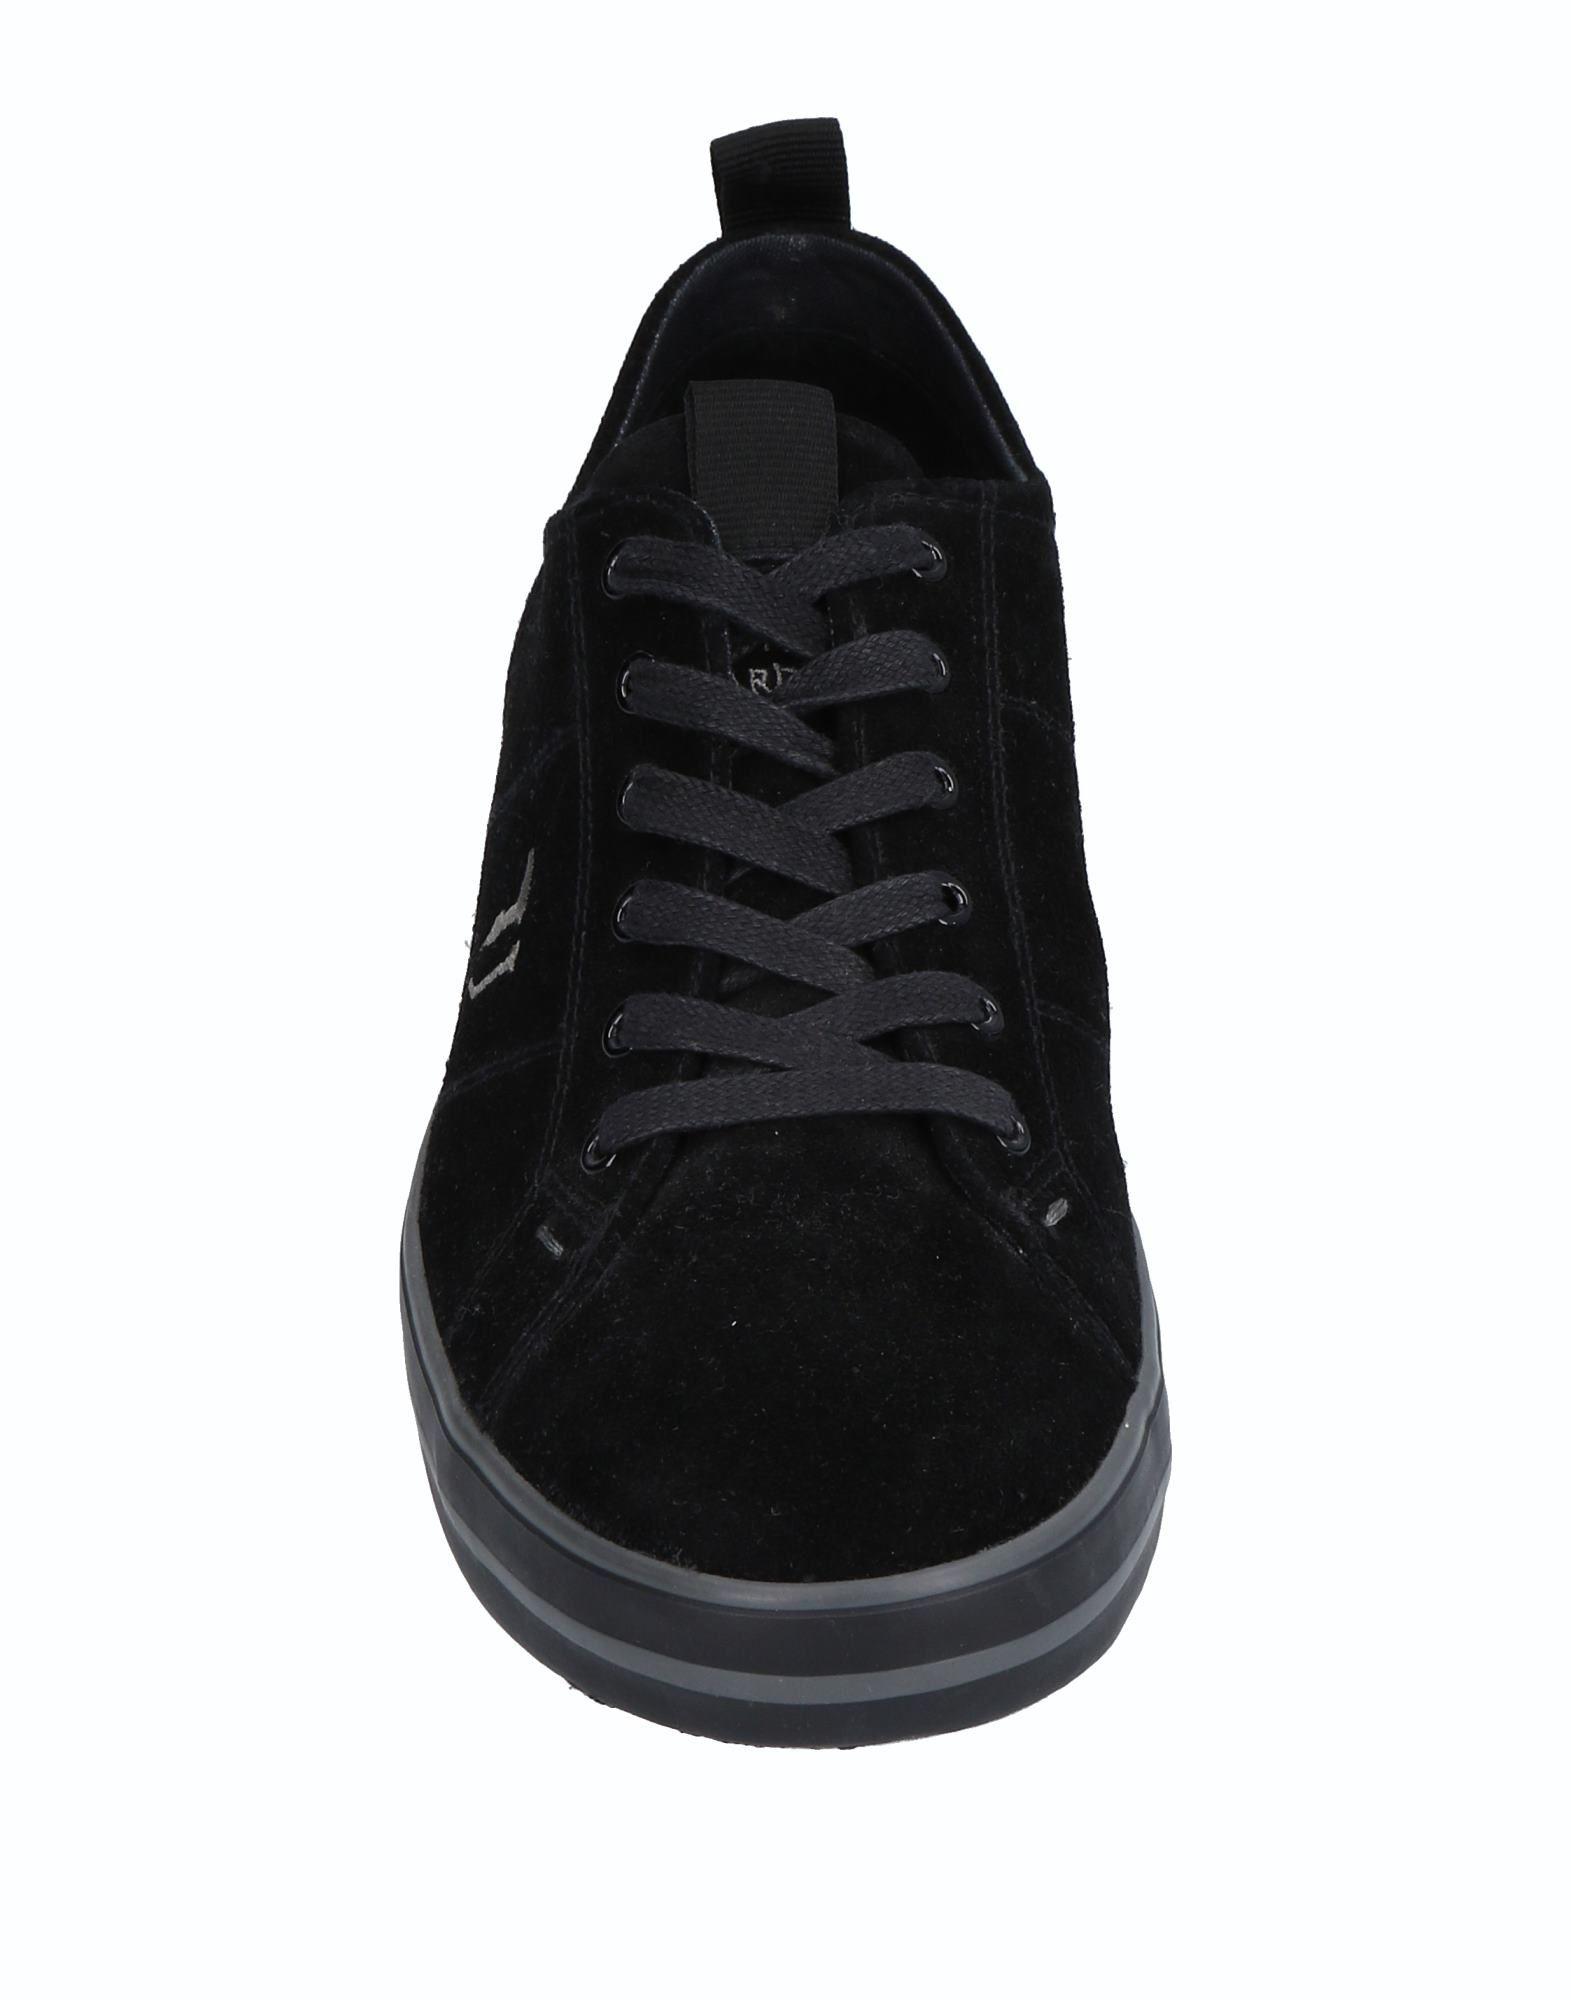 Rabatt echte Schuhe Trussardi Jeans Sneakers Herren 11514372QE  11514372QE Herren ed9534